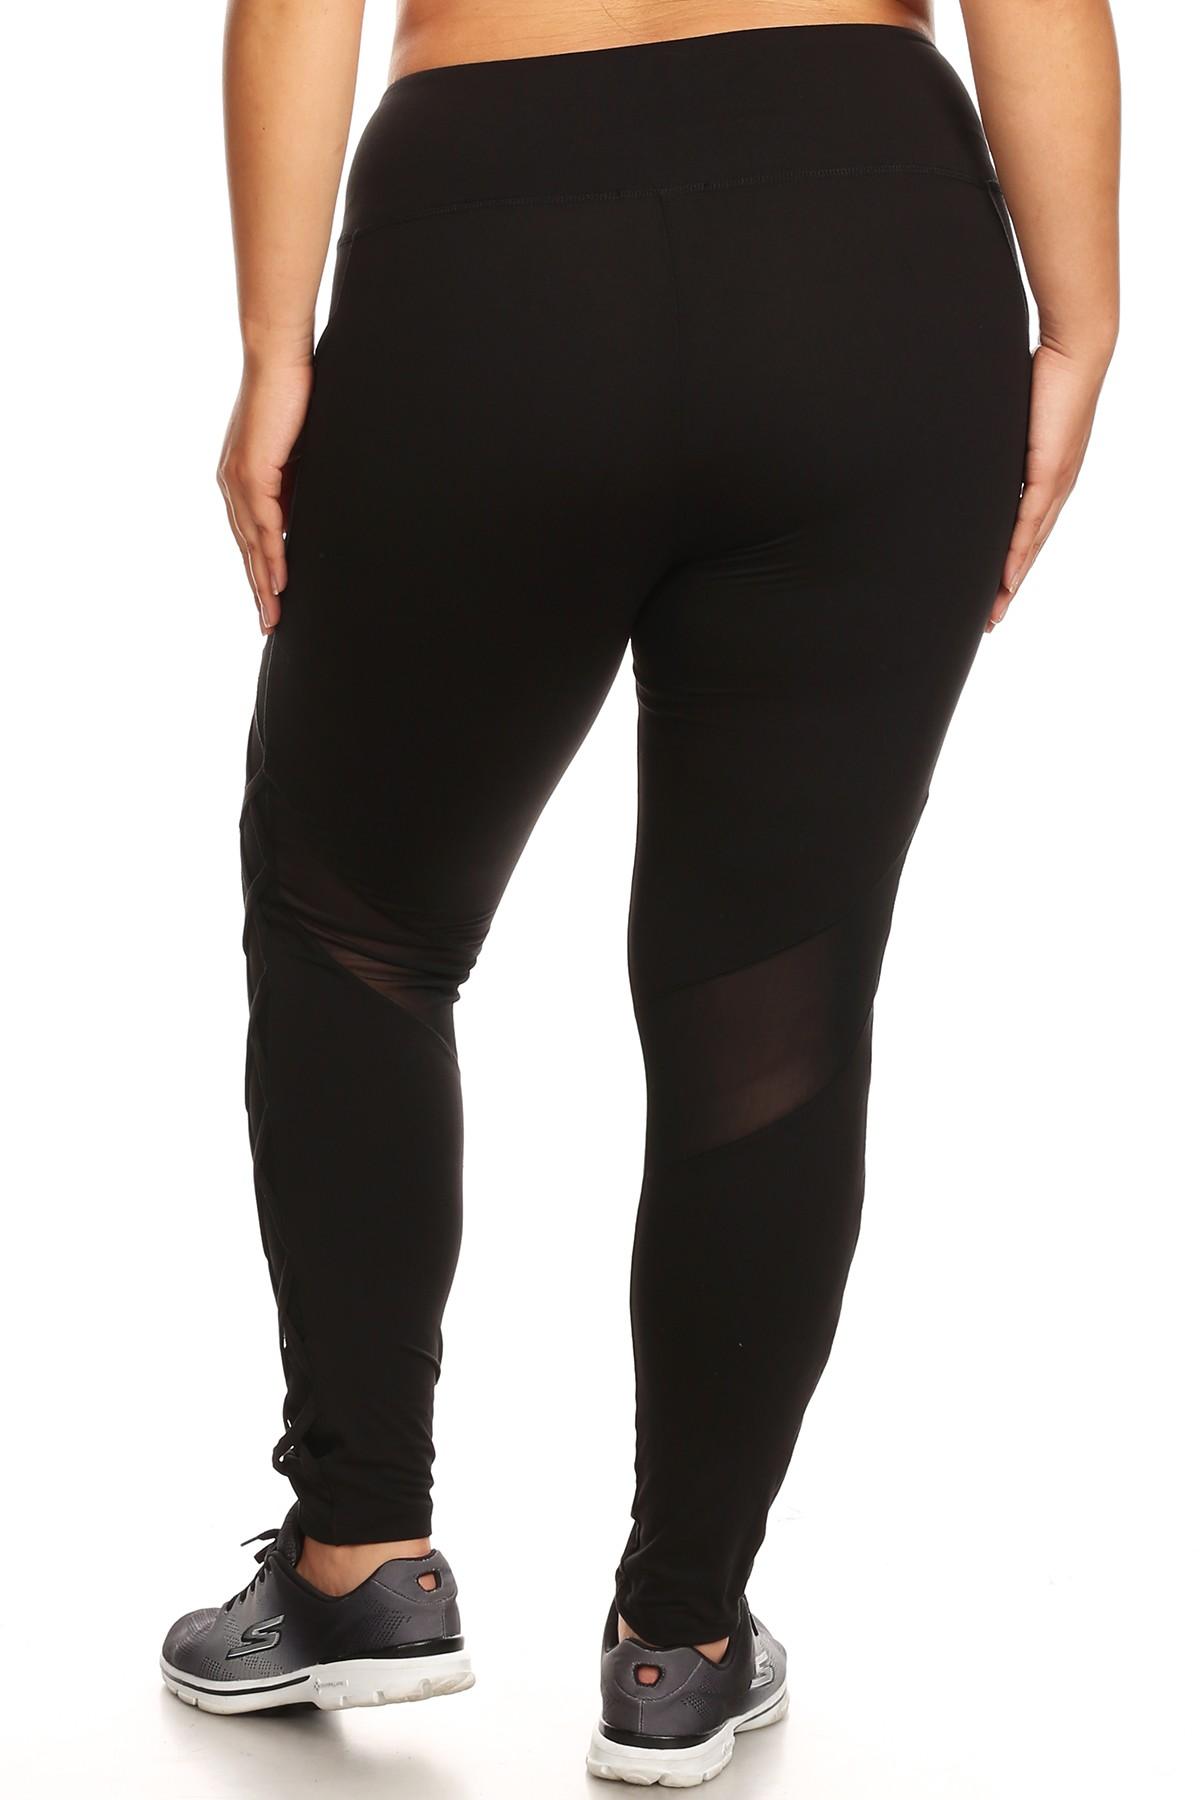 600e80de079 Women s Crisscross Mesh Workout Plus Size Leggings